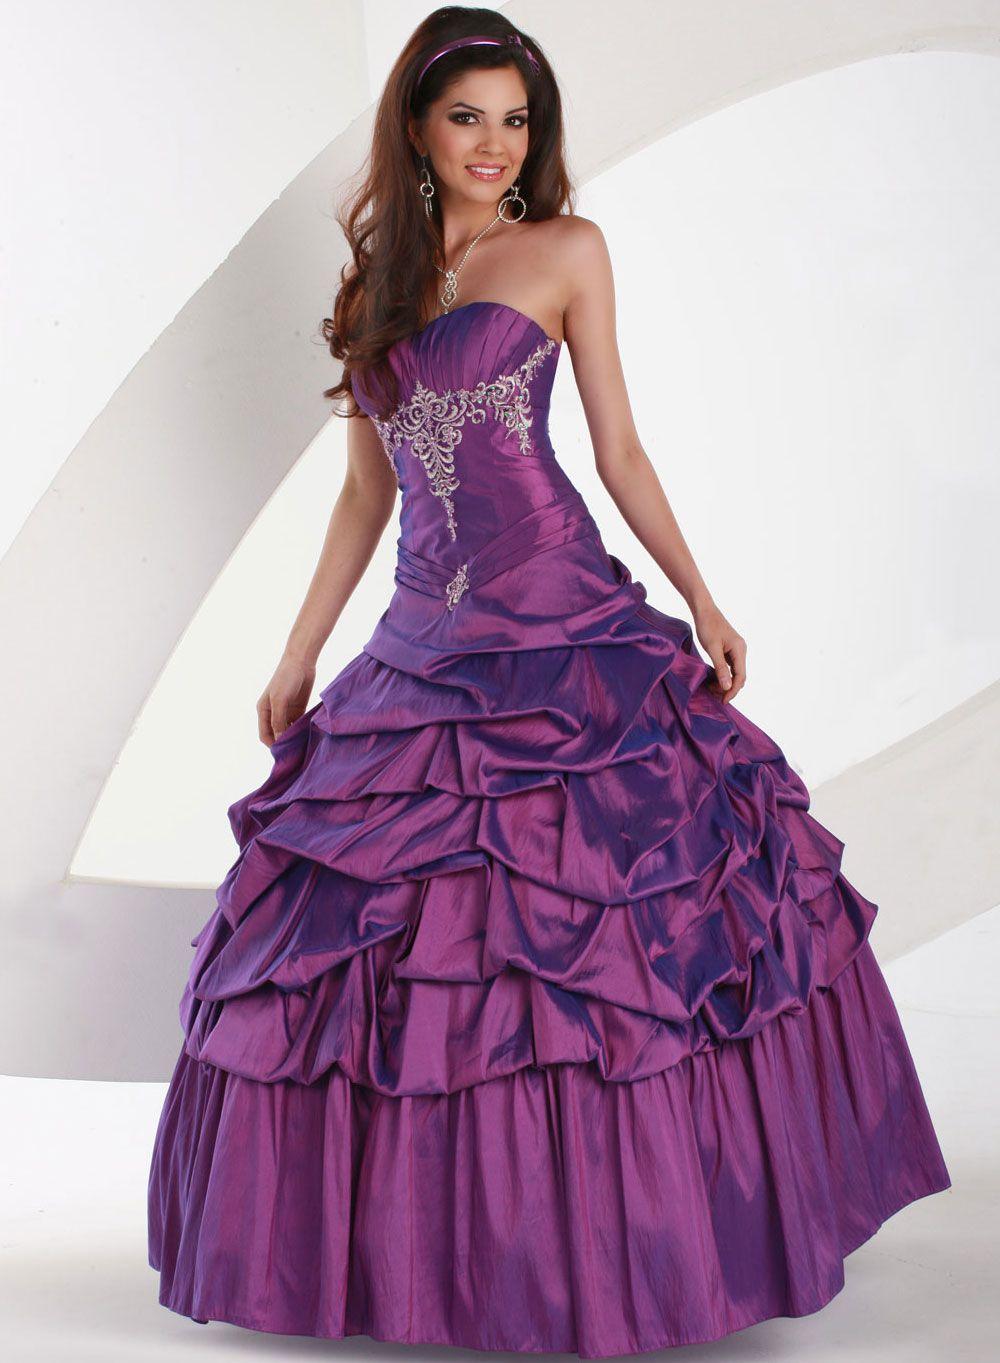 Vestidos de 15 color morado. | 15 anos | Pinterest